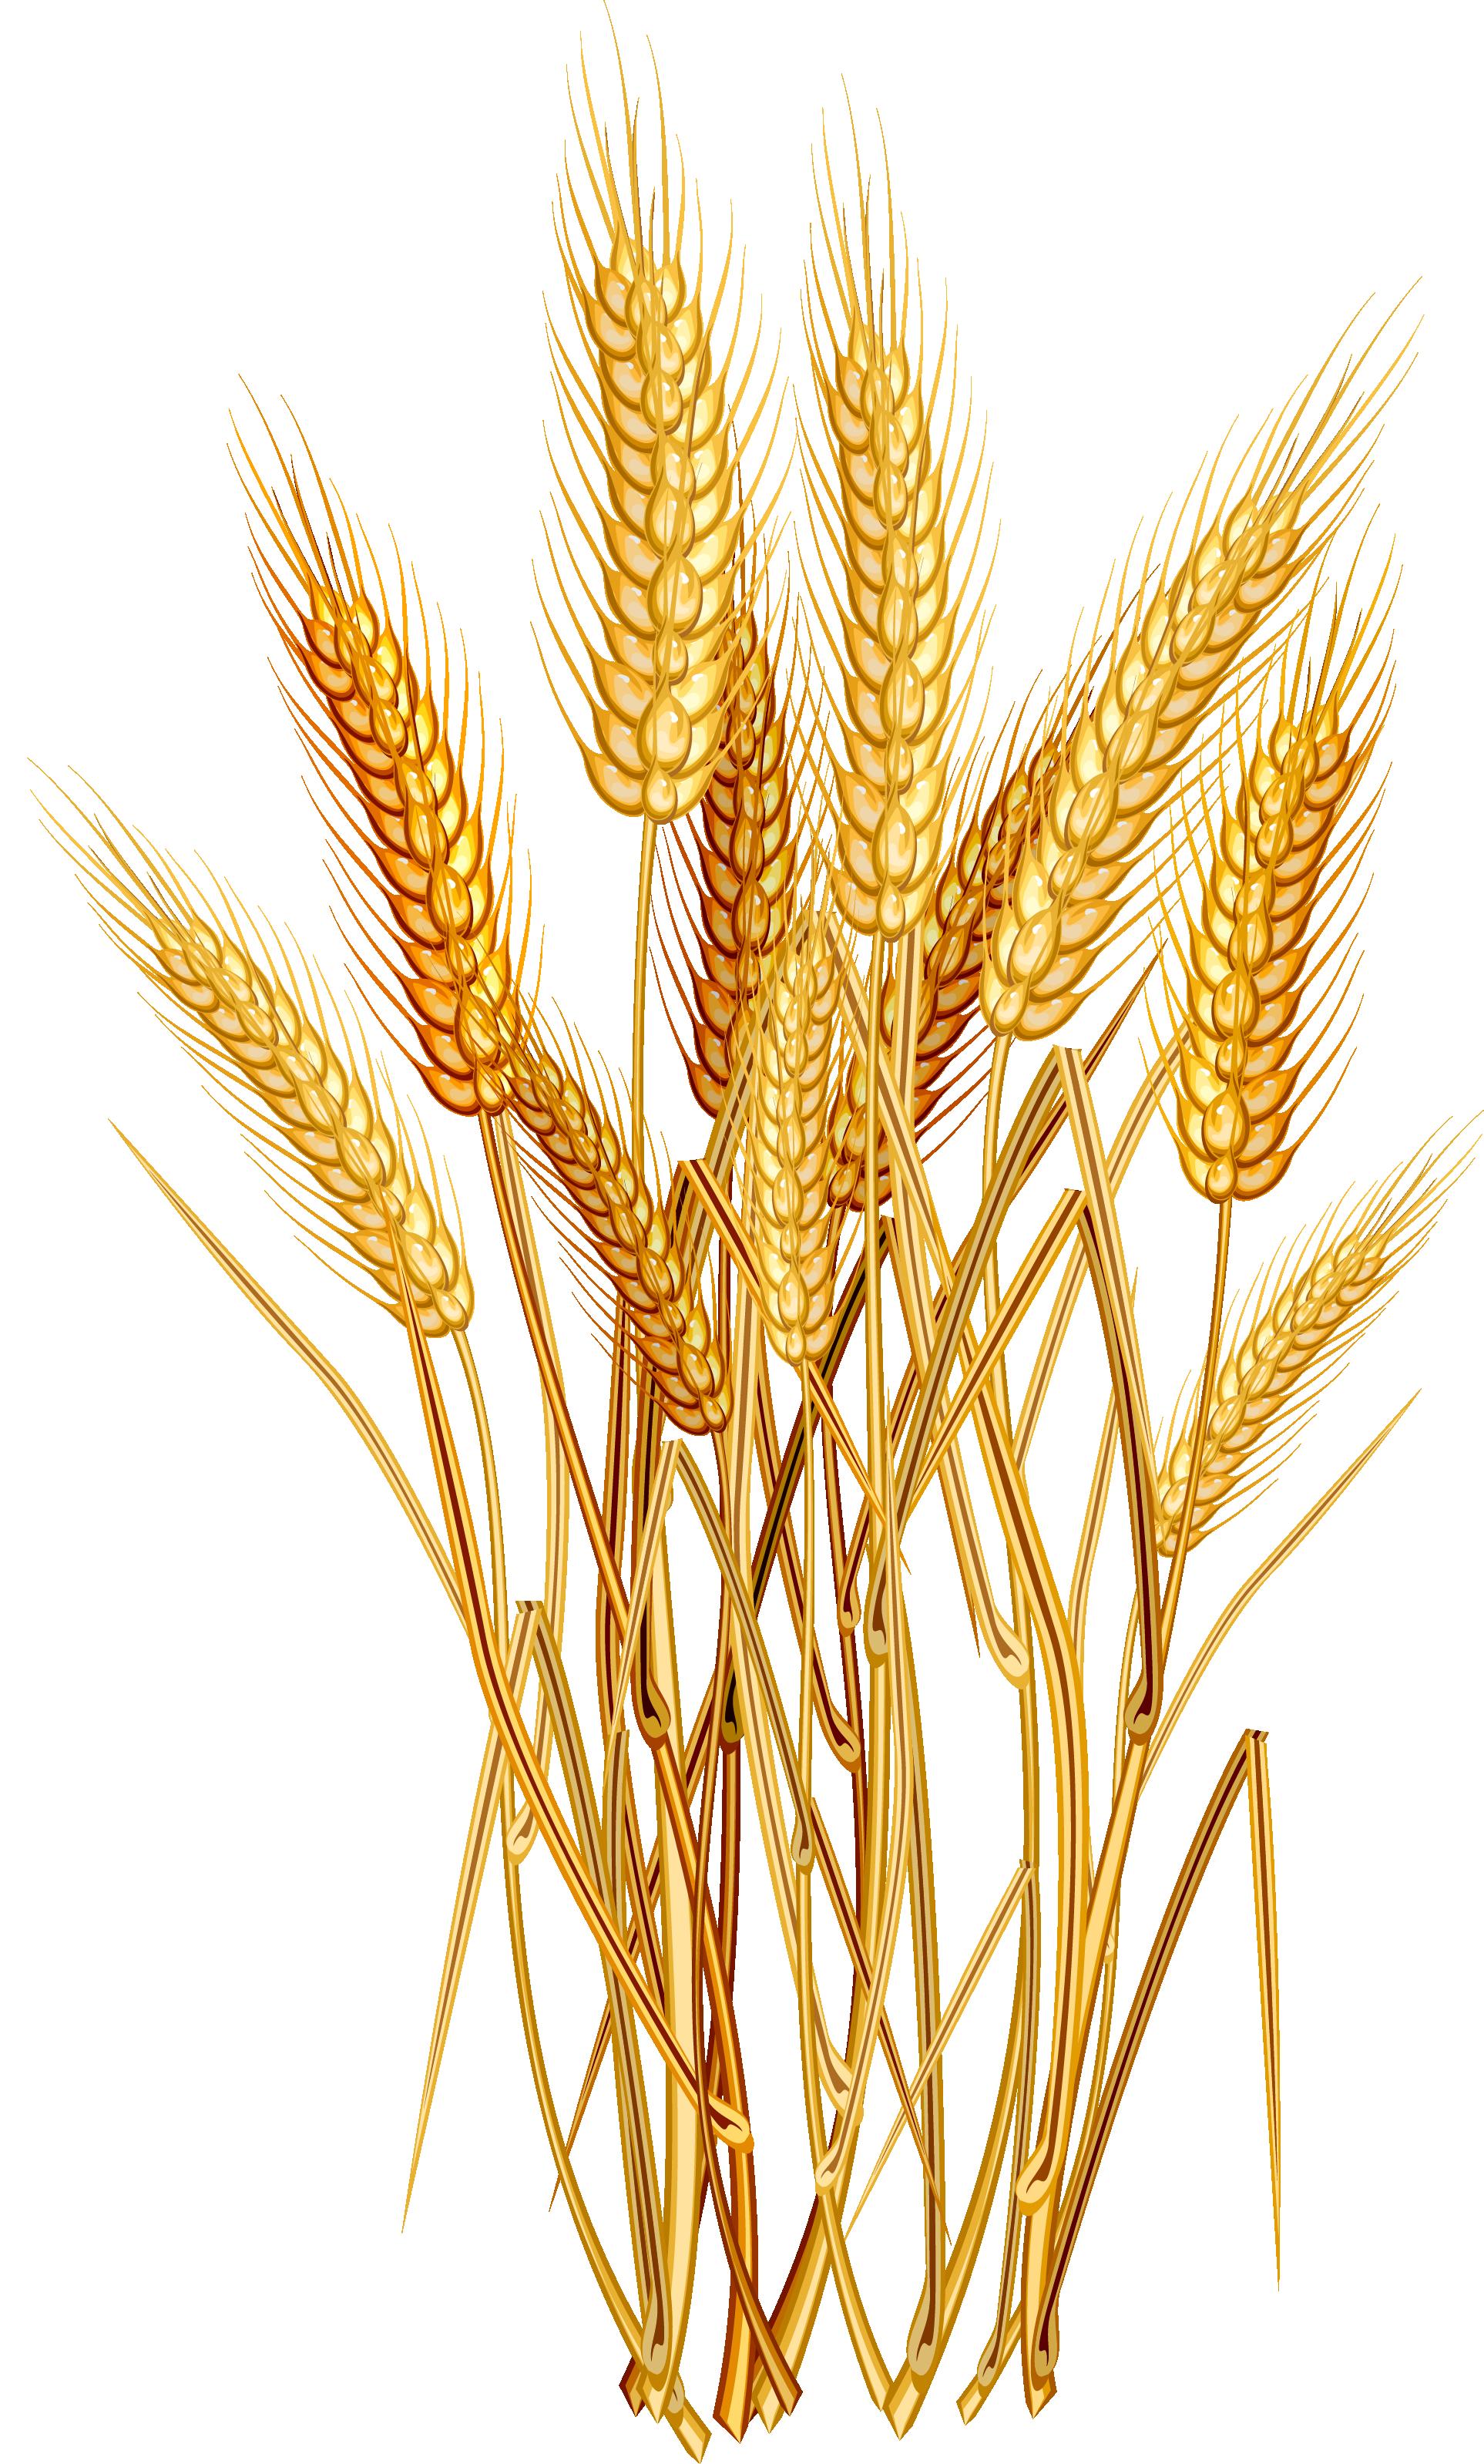 clipart download Euclidean vector clip art. Grains clipart wheat crop